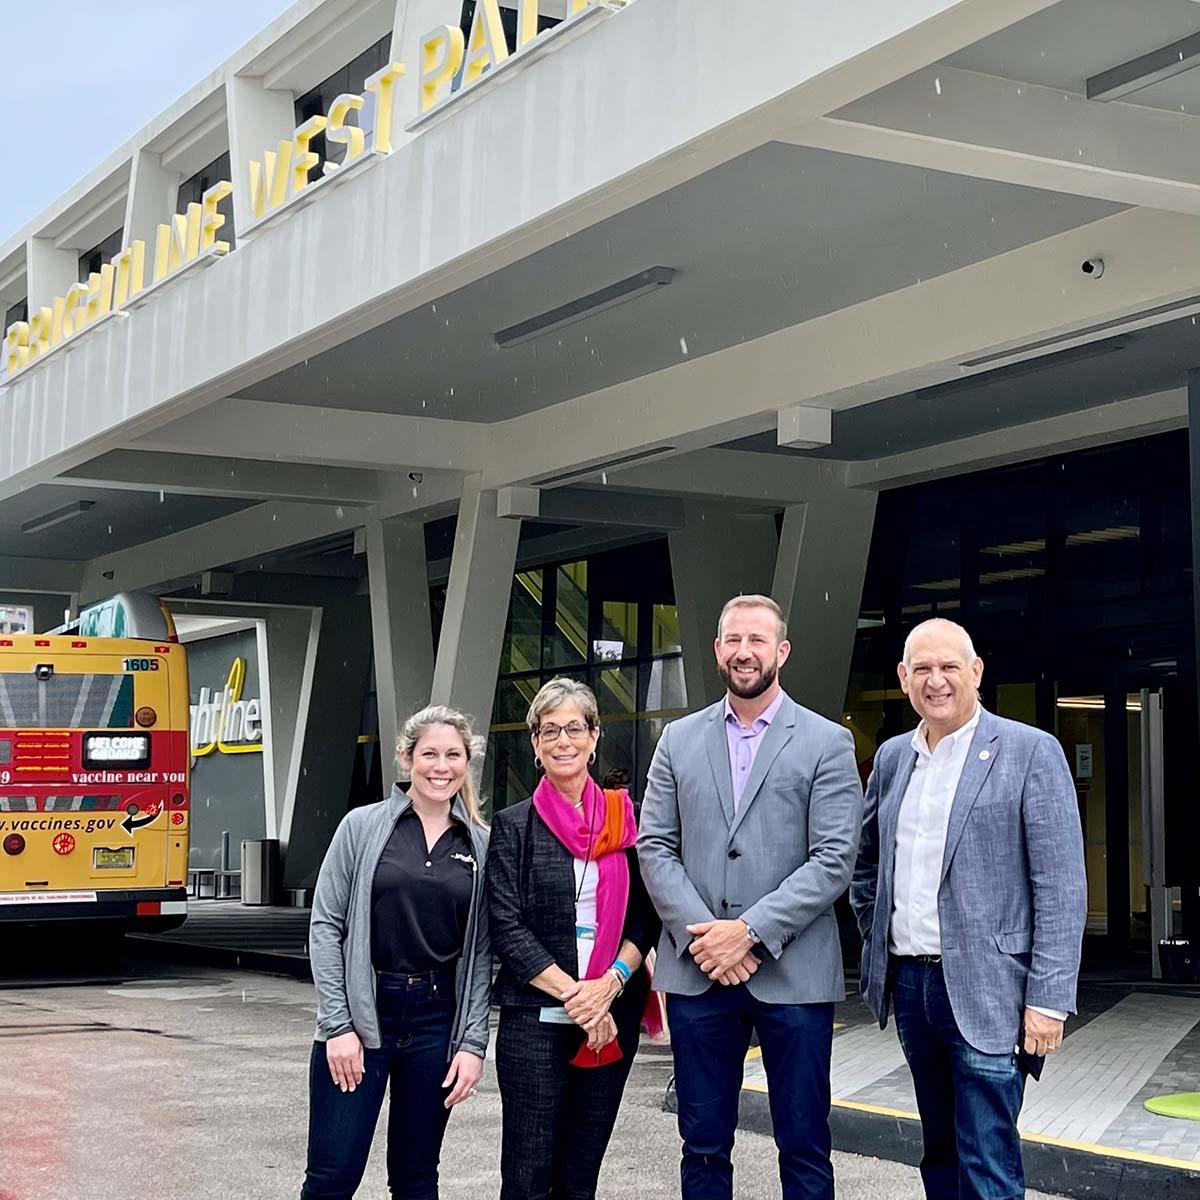 Brightline Chief of Staff Ali Soule, Commissioner Maria Marino, Brightline President Patrick Goddard and Vice Mayor Robert Weinroth